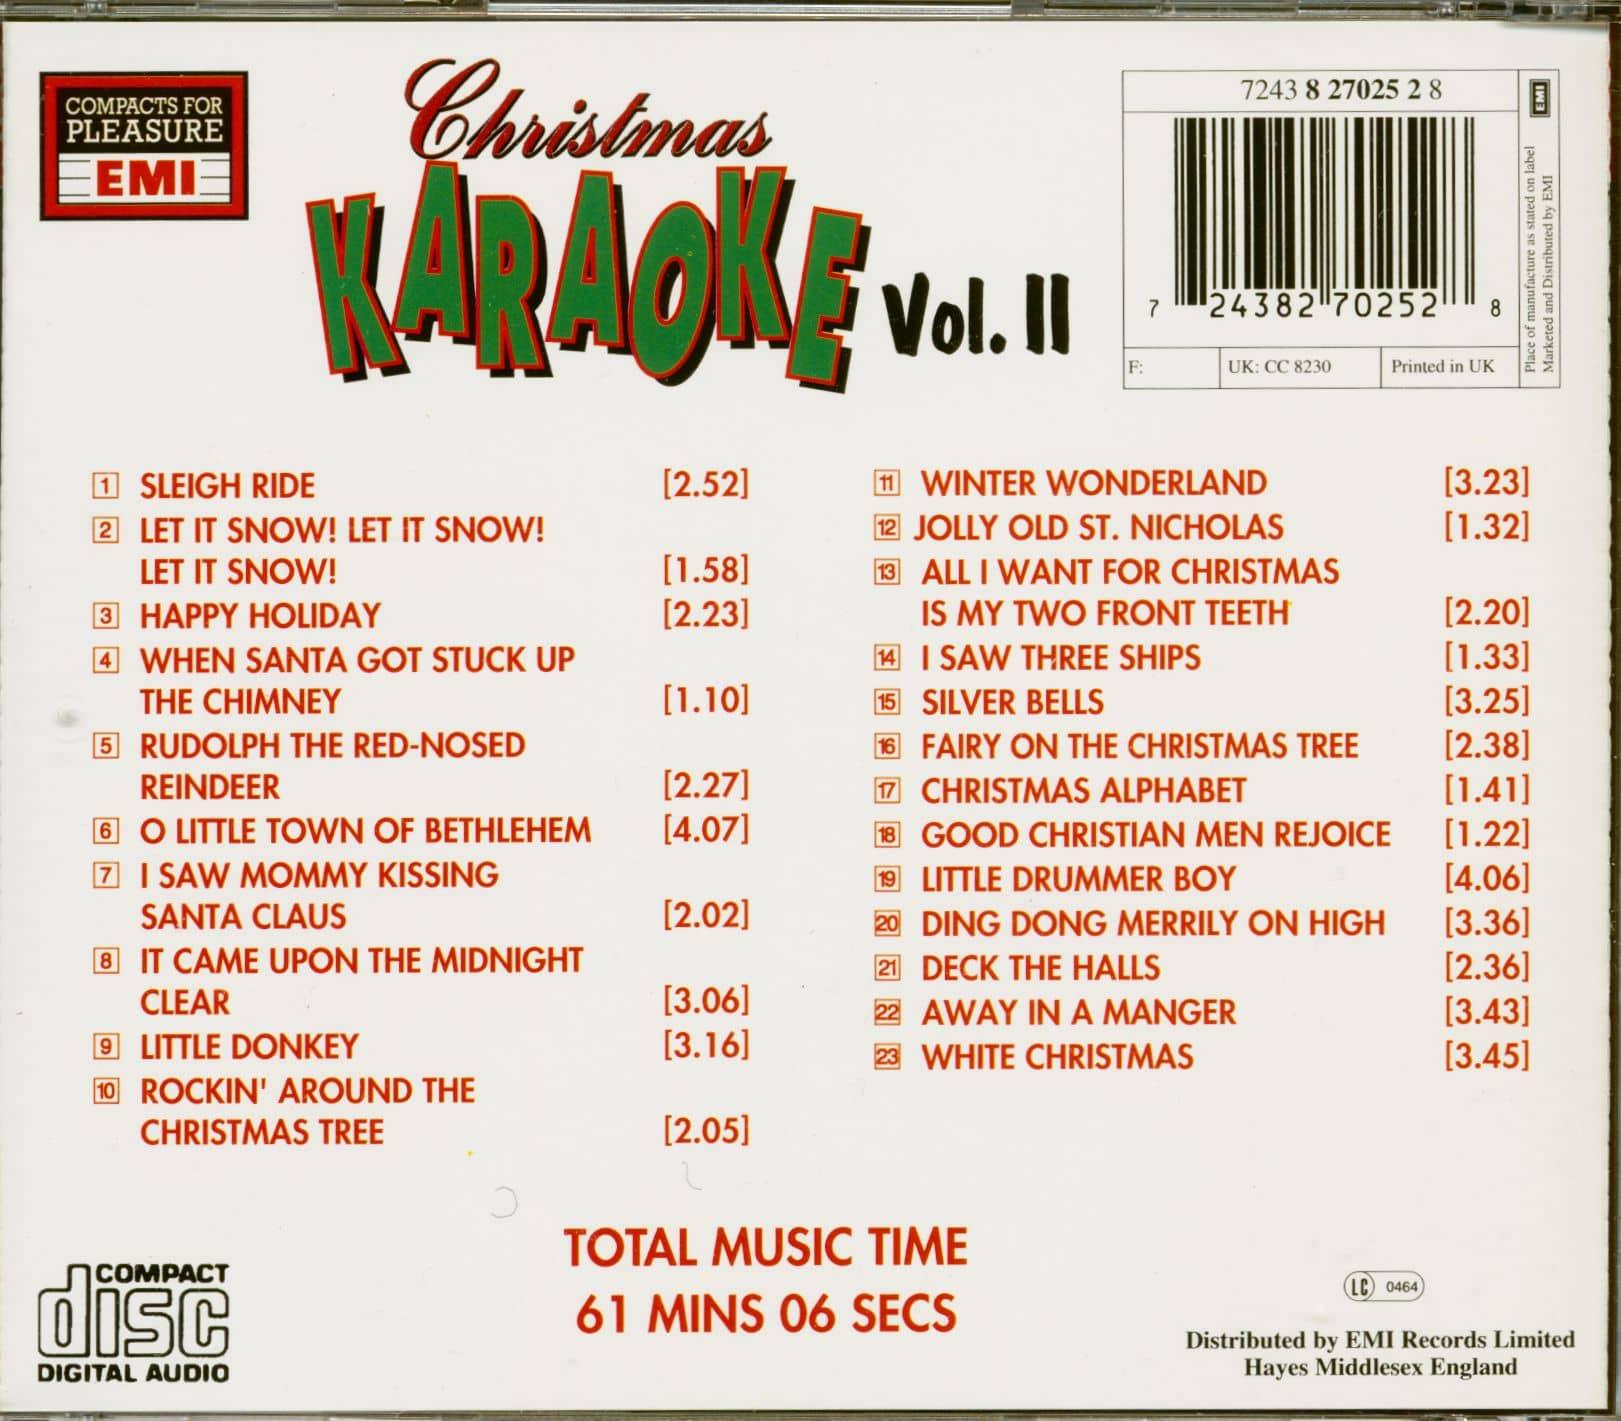 Christmas Karaoke Cd.Various Christmas Karaoke Vol 2 Cd